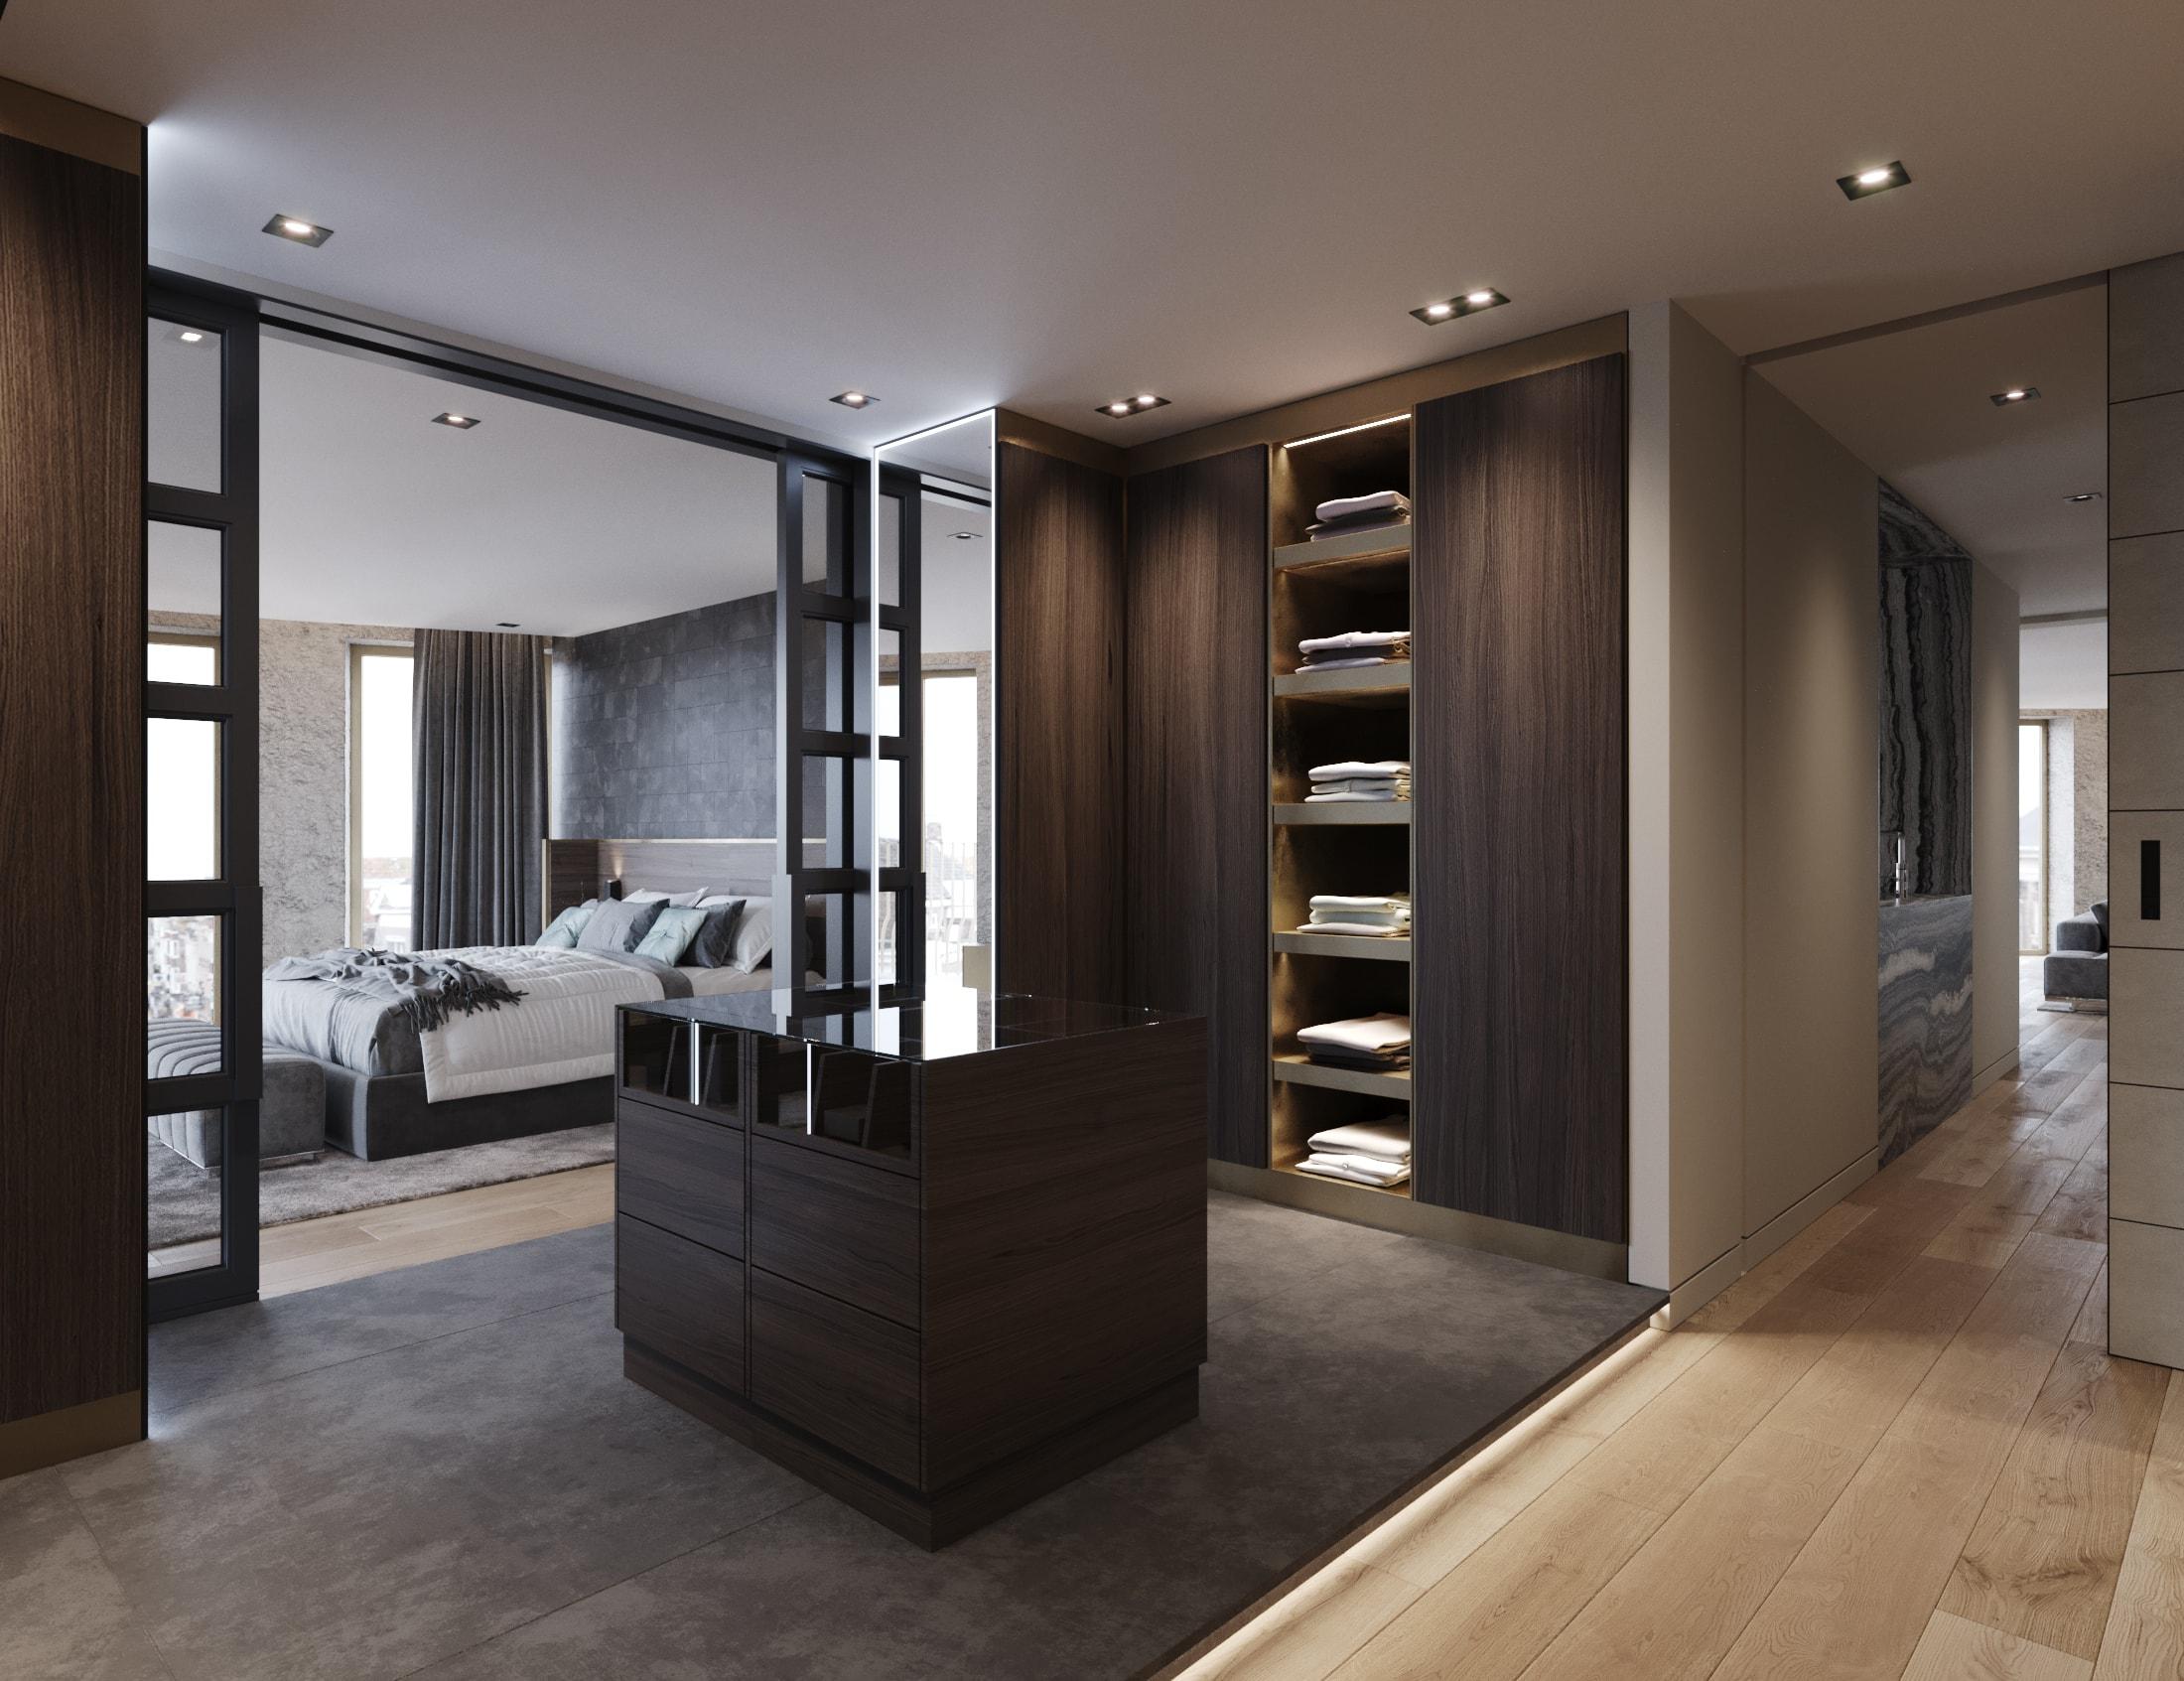 Interieur De Luxe Appartement merckt groningen interieur ontwerp | duin interior